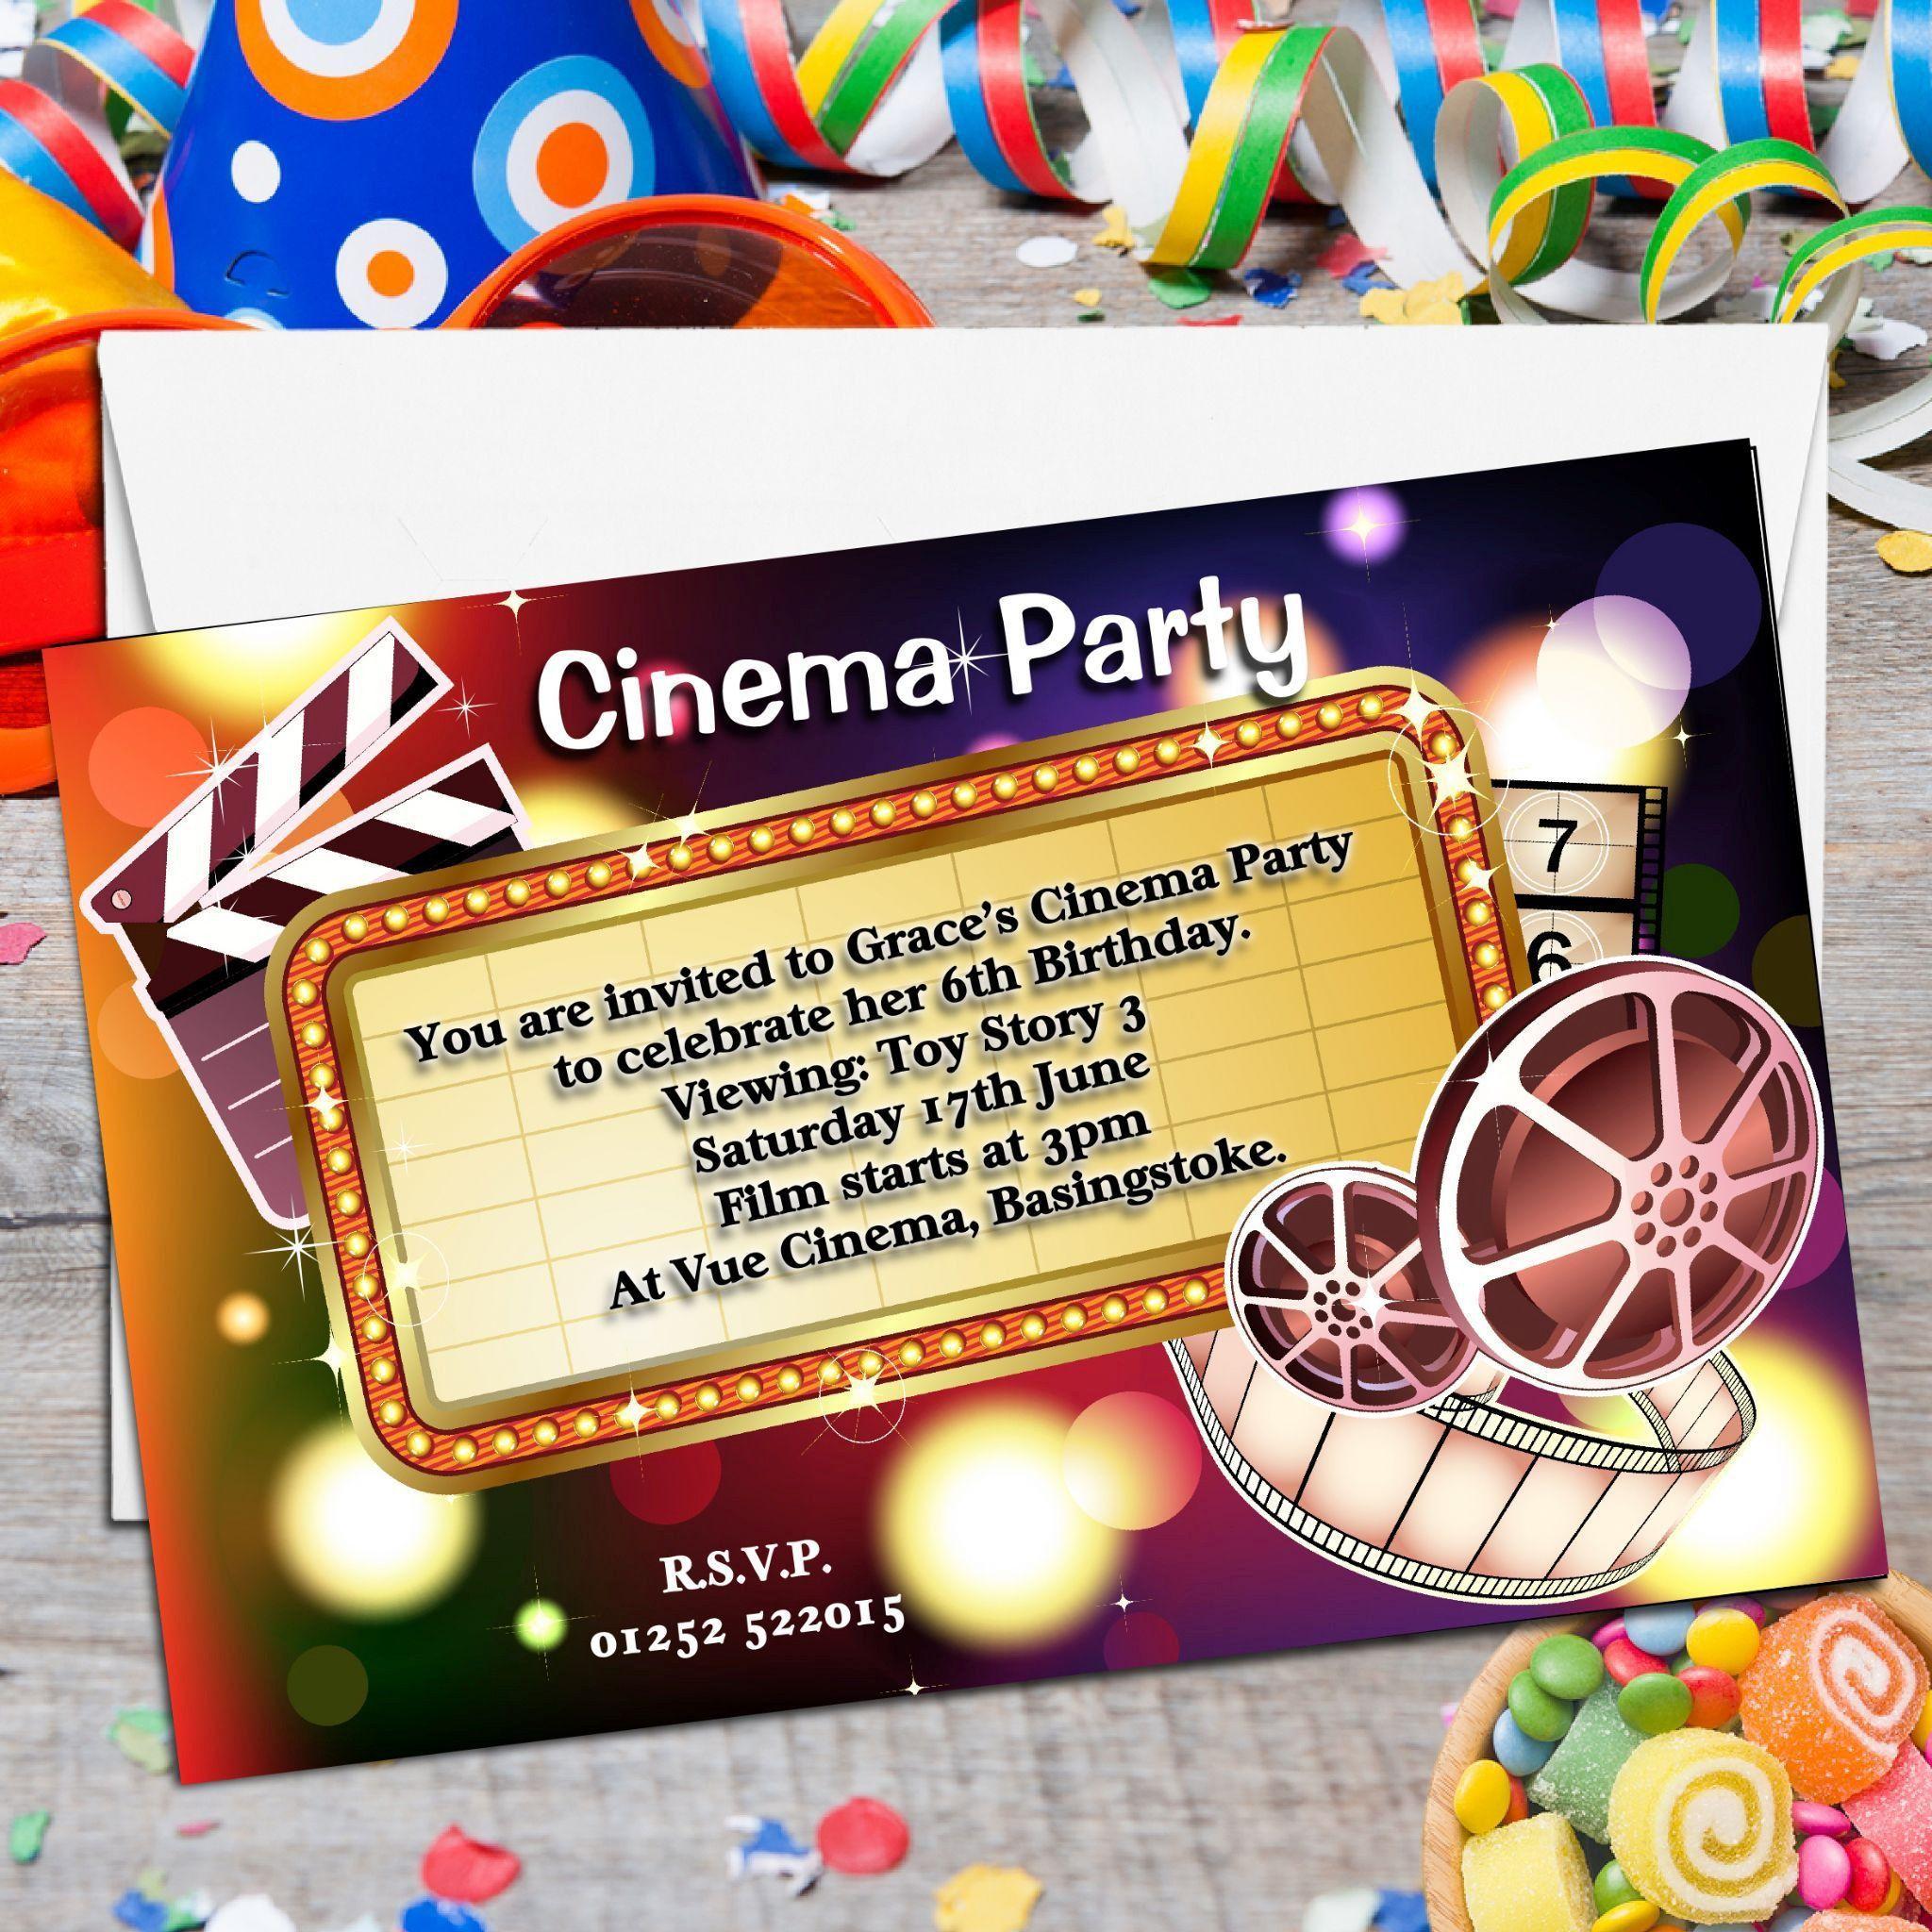 Kindergeburtstag Kino Einladung Kostenloskindergeburtstag Kino